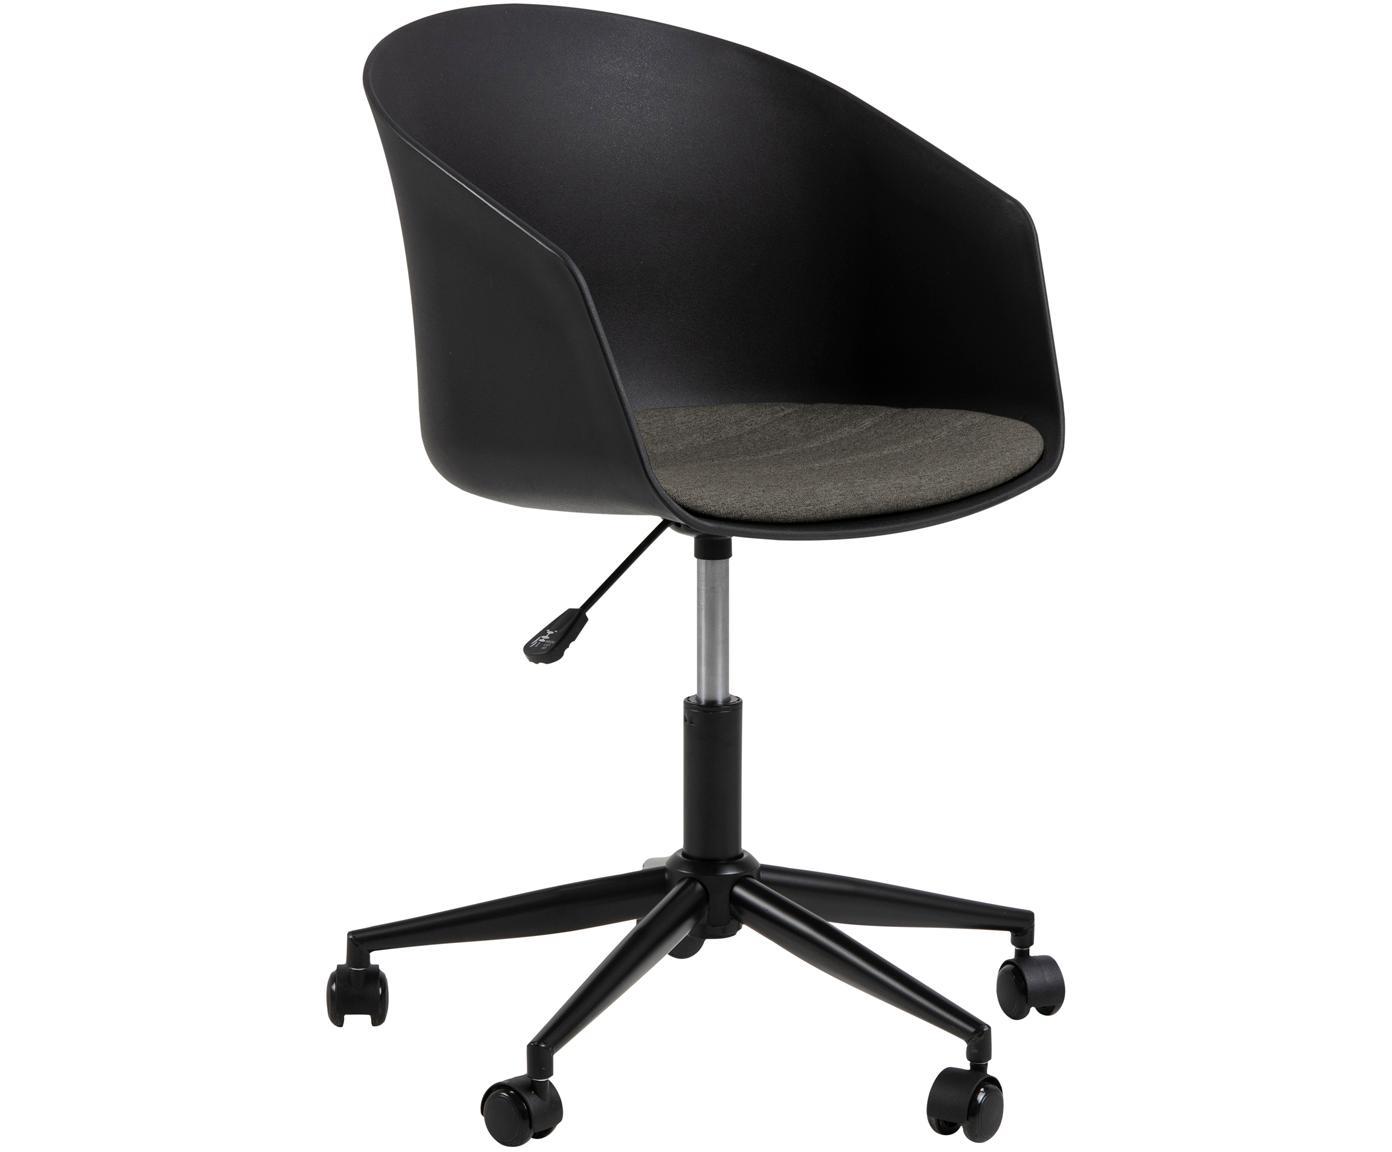 Sedia da ufficio Moon, Polipropilene, tessuto, metallo, Nero, grigio scuro, Larg. 65 x Prof. 65 cm